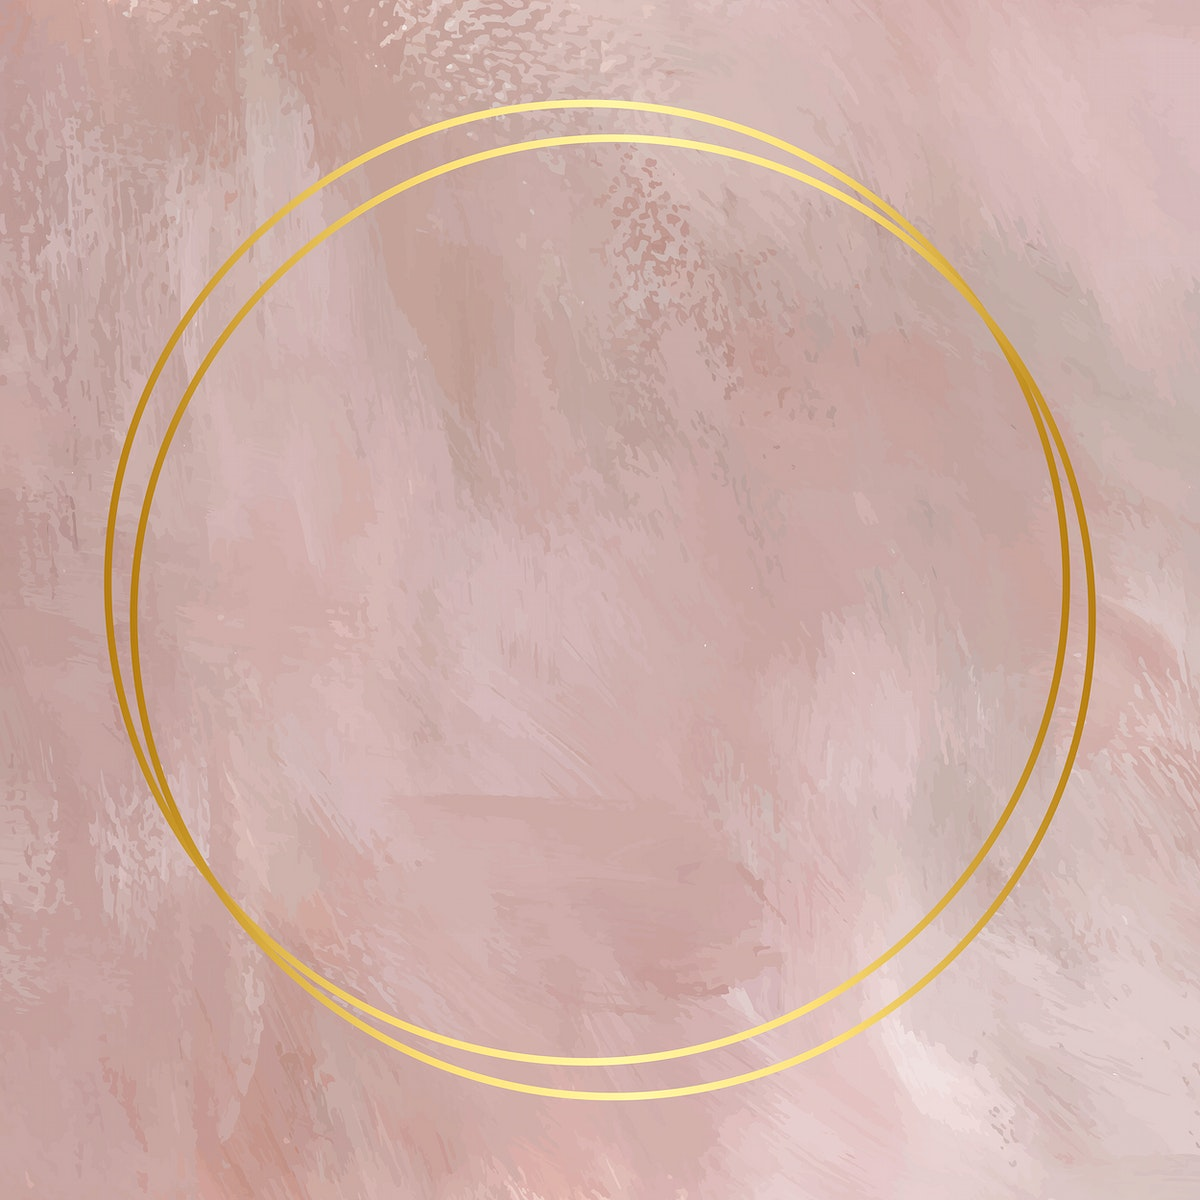 gold frame on on pink background vector